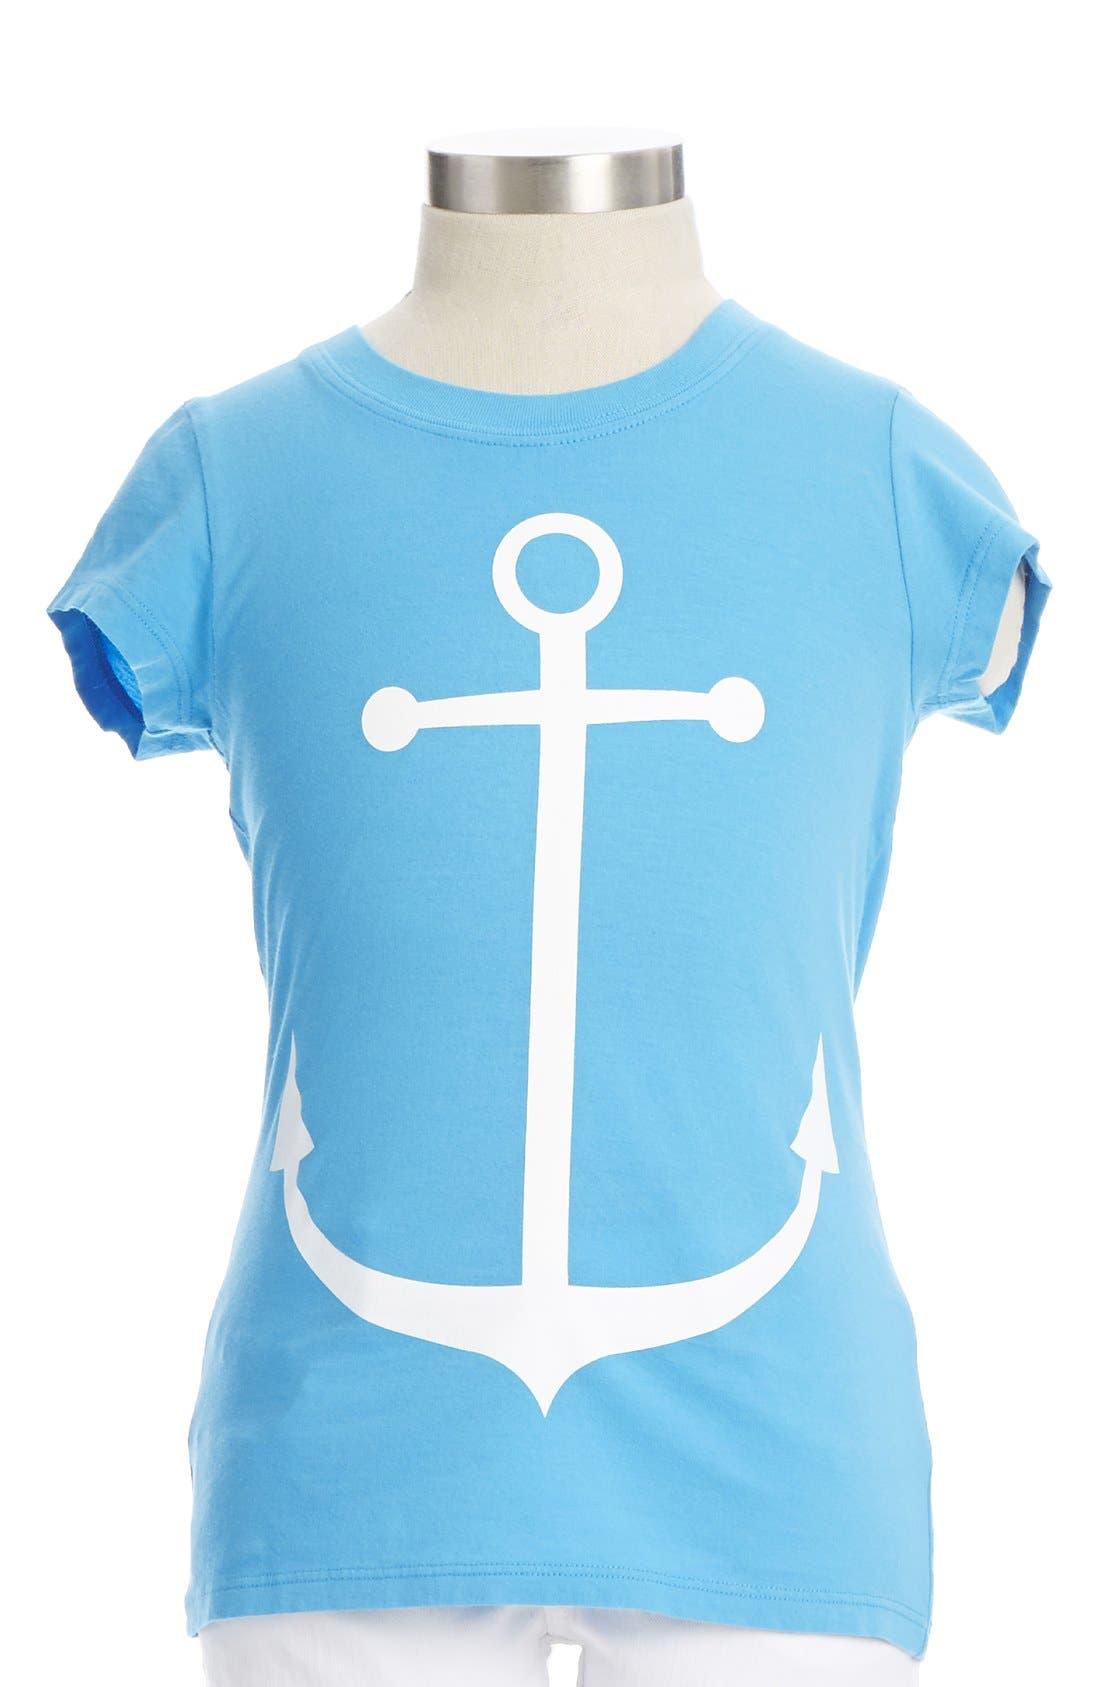 Main Image - Peek 'Anchor' Cotton Tee (Big Girls)